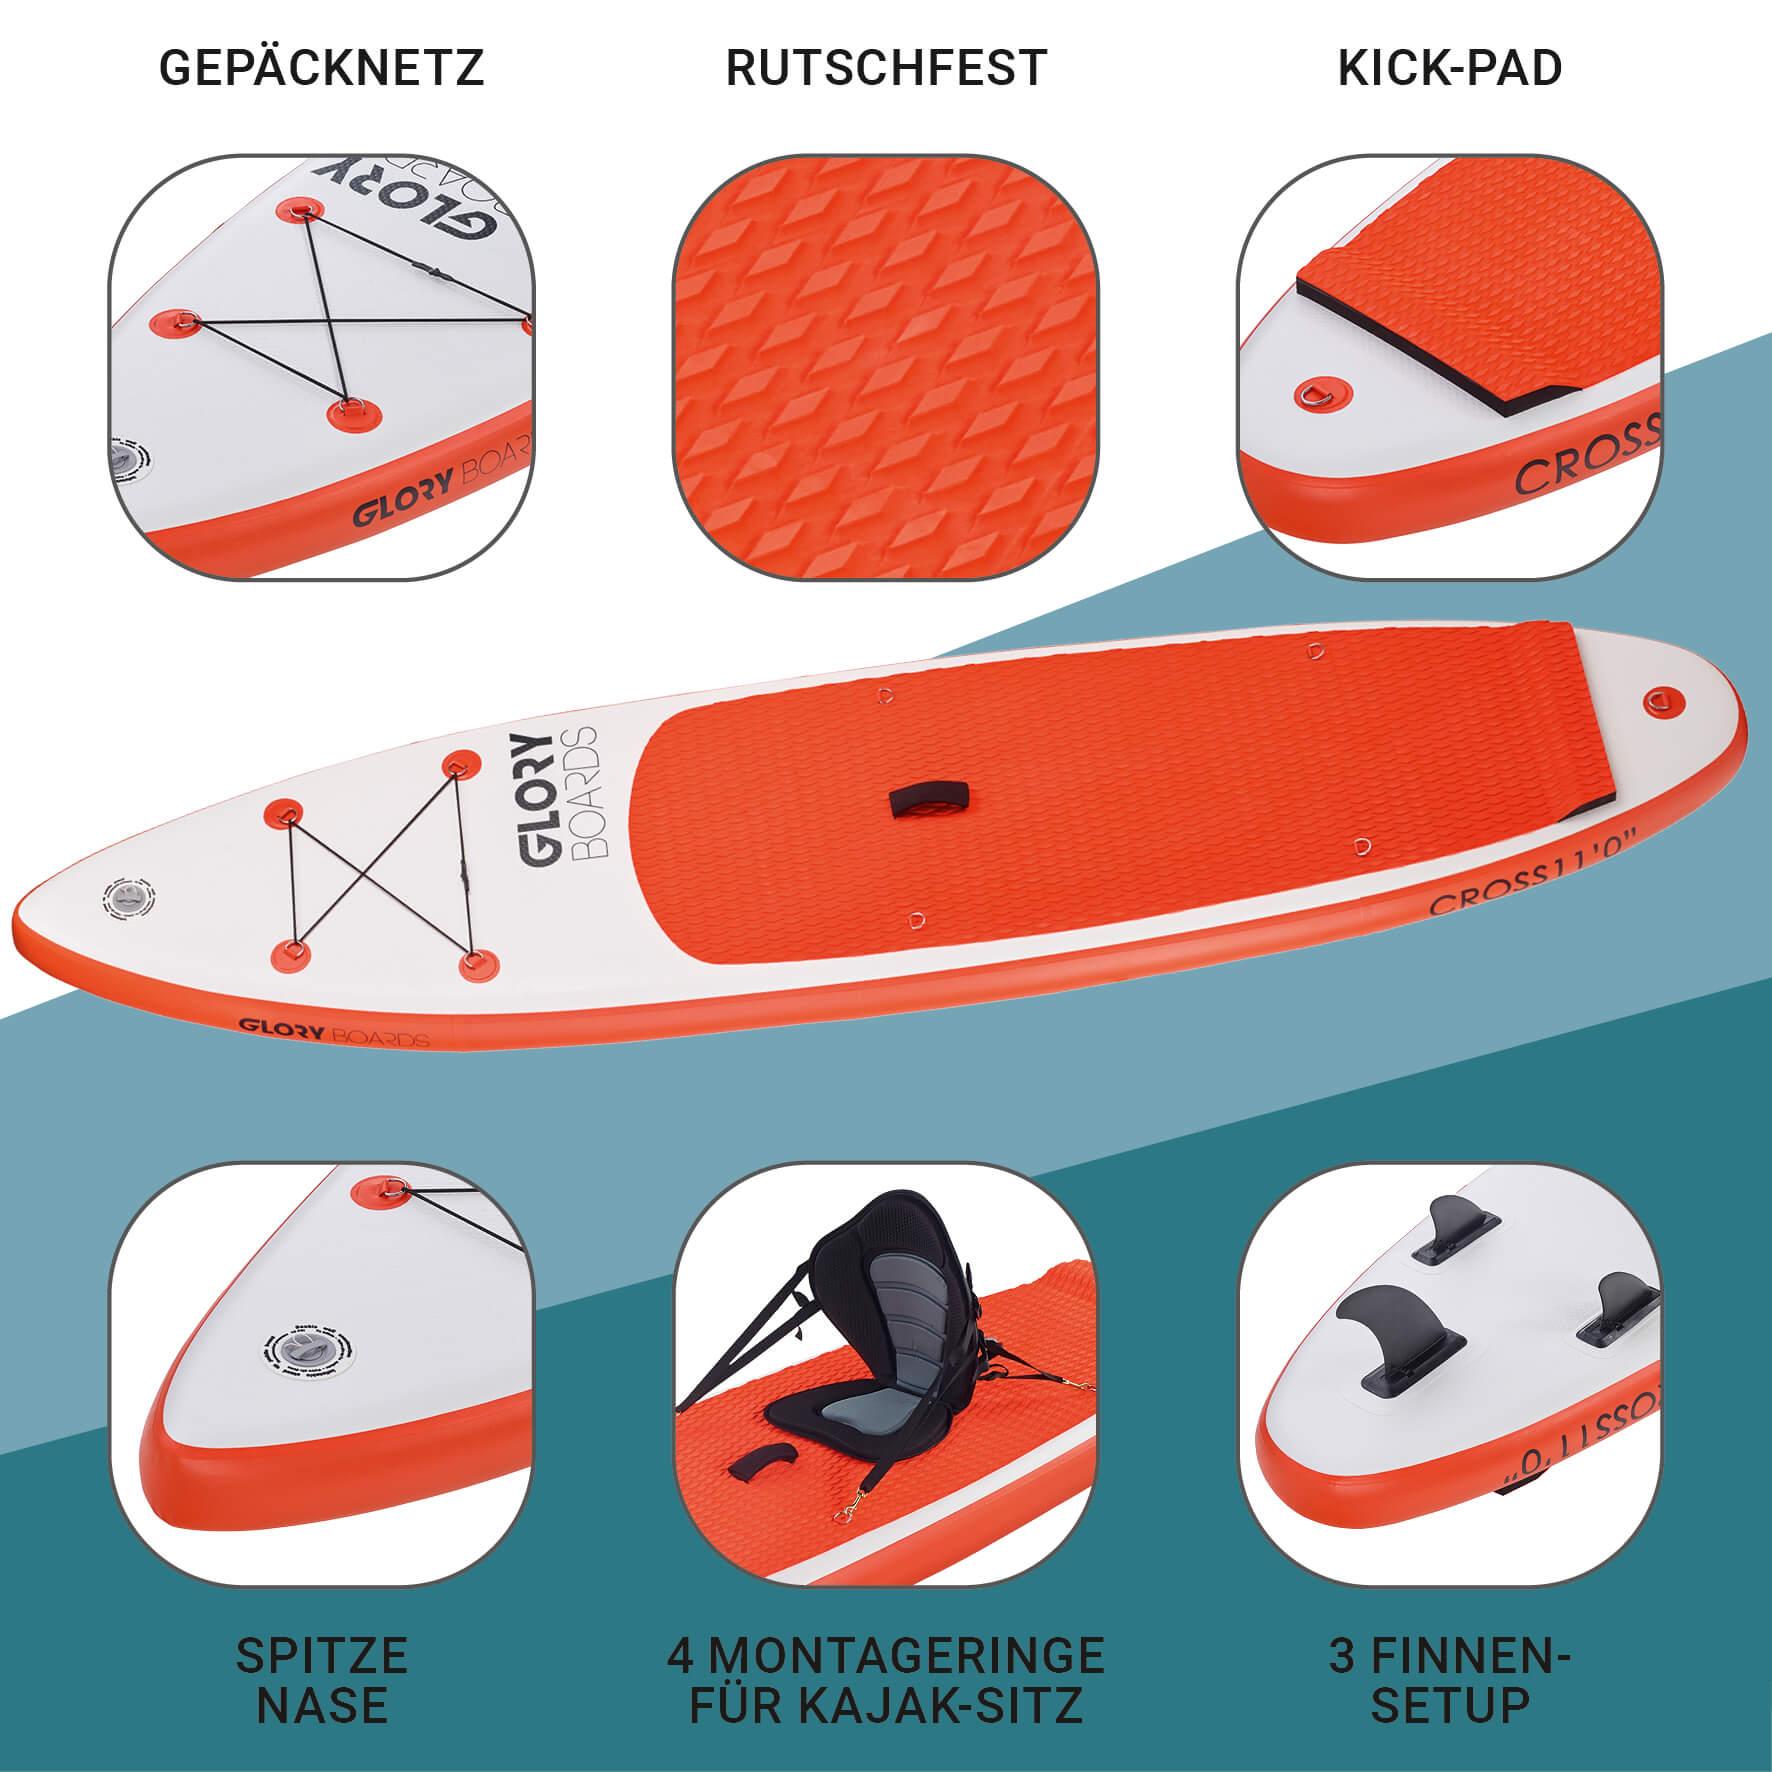 CROSS 11'0'' Allround SUP Set in Orange mit Carbon Paddel